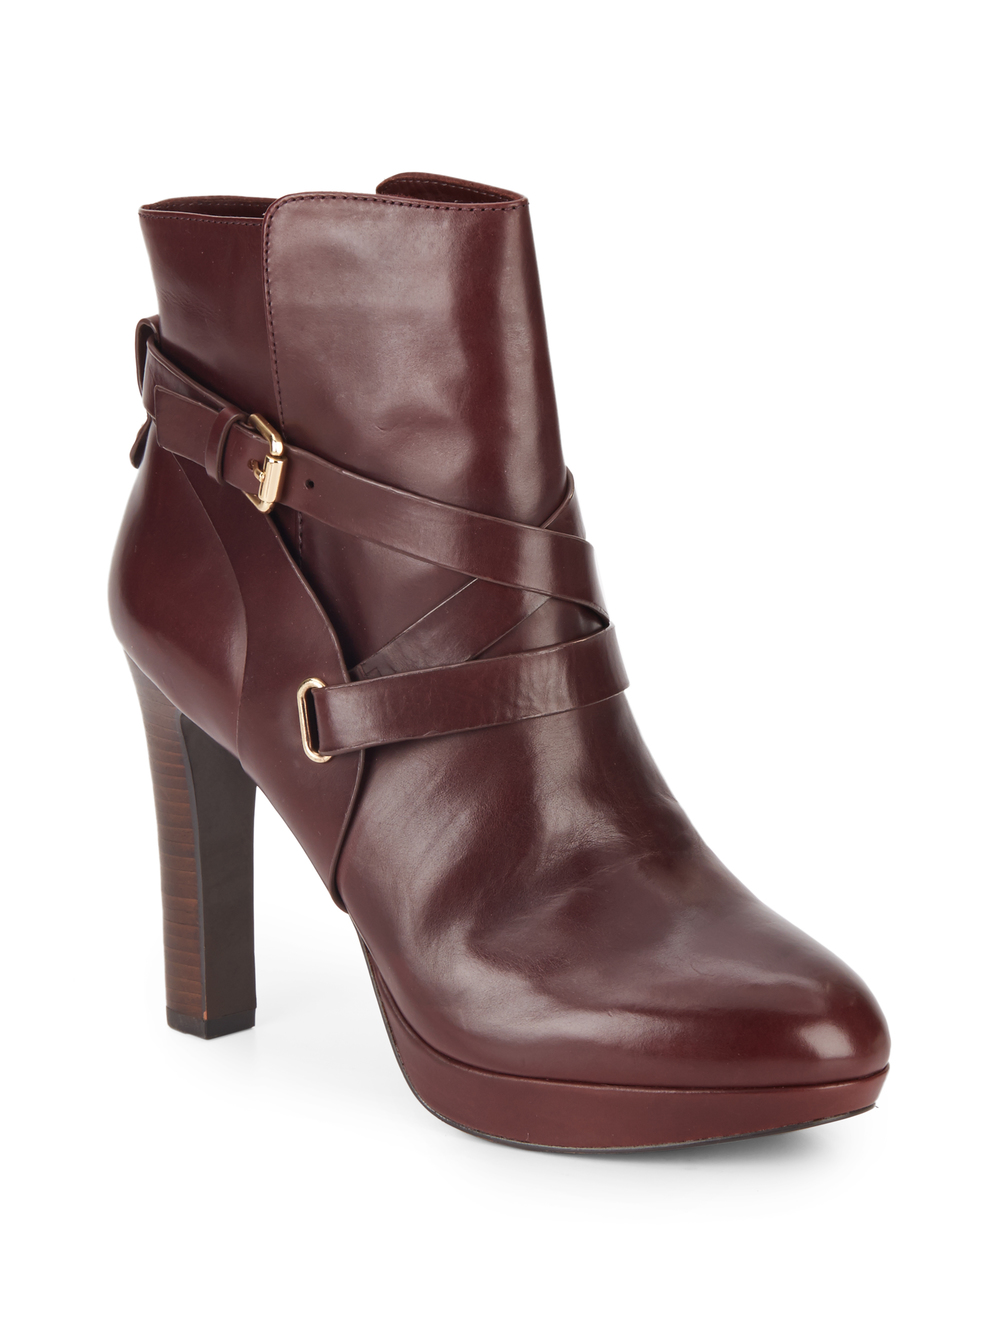 Shoes-016.JPG